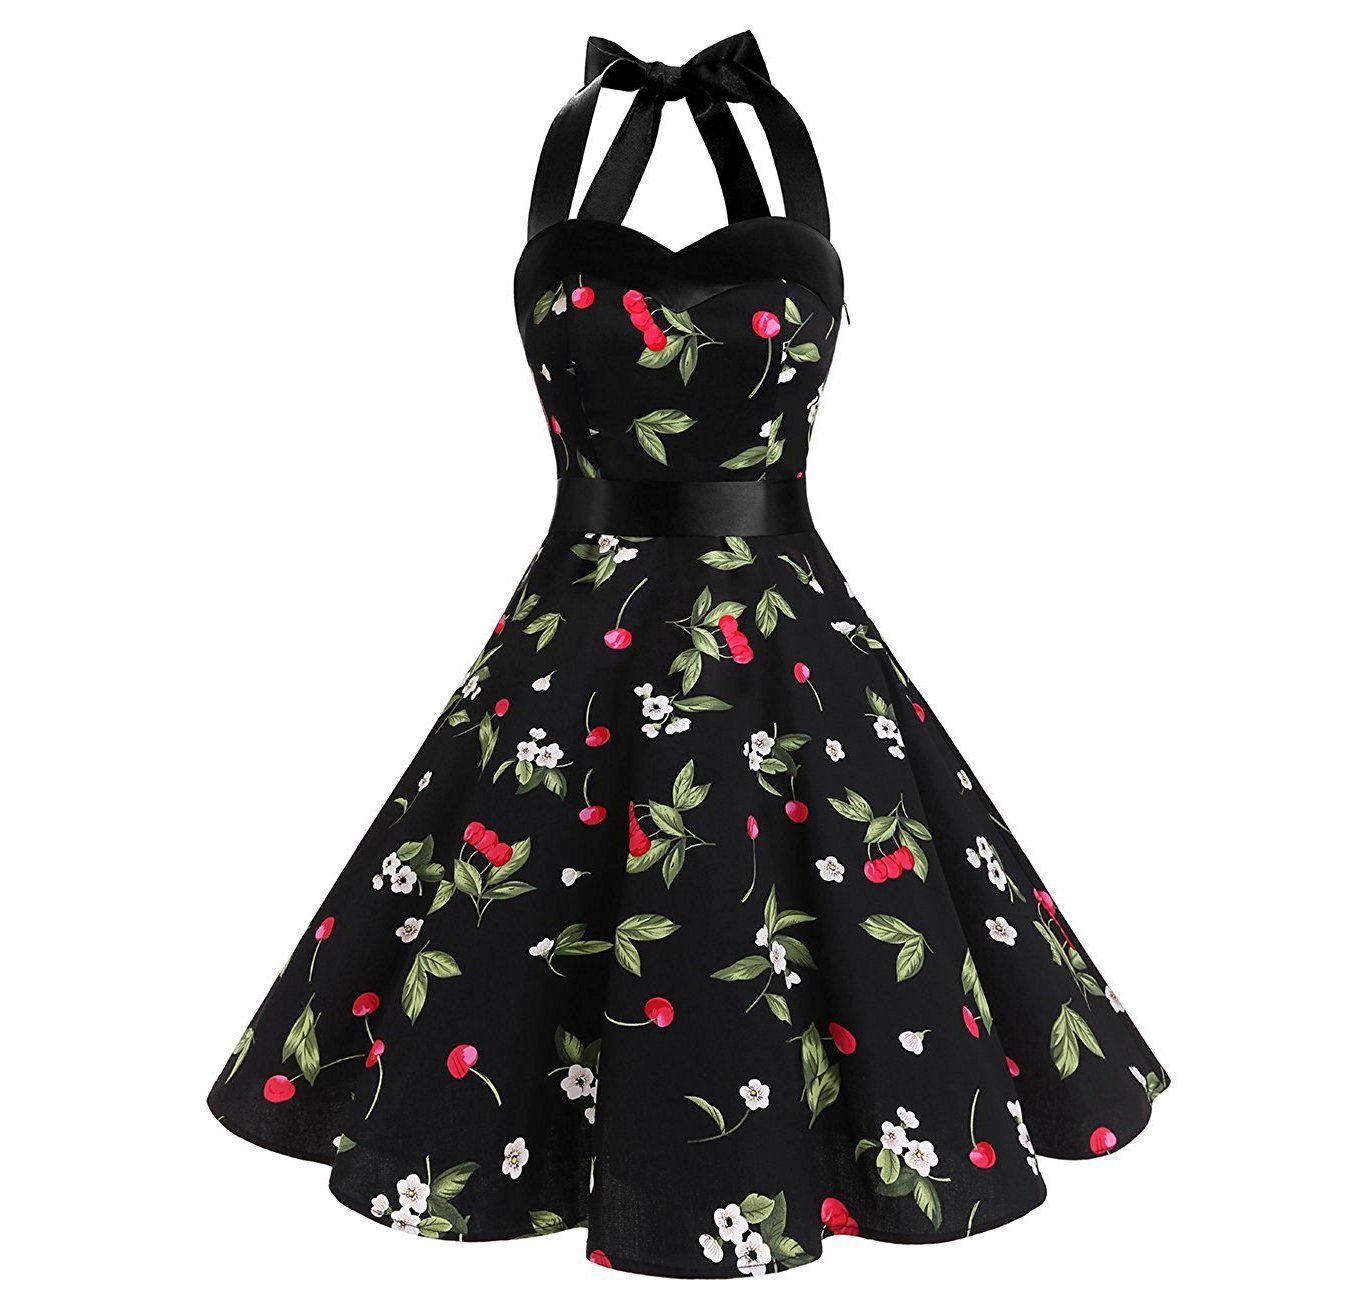 Cherry Printed Halter Dress Audrey Hepburn 50s Style Dresses 50s